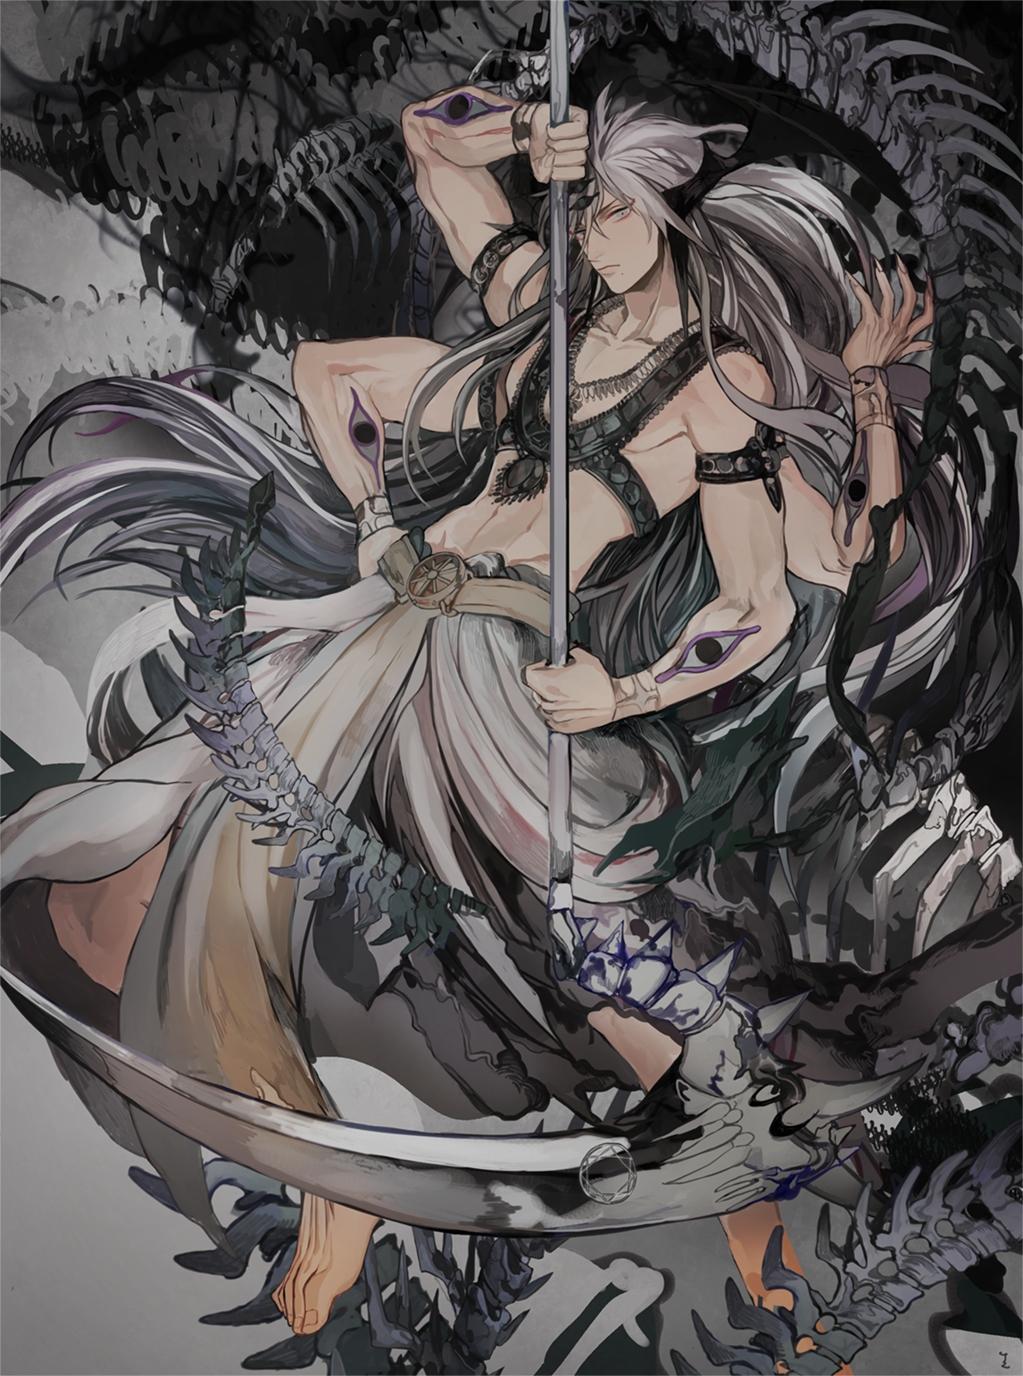 Ren.Hakuryuu.full.1910010.jpg (1023×1376) Anime magi